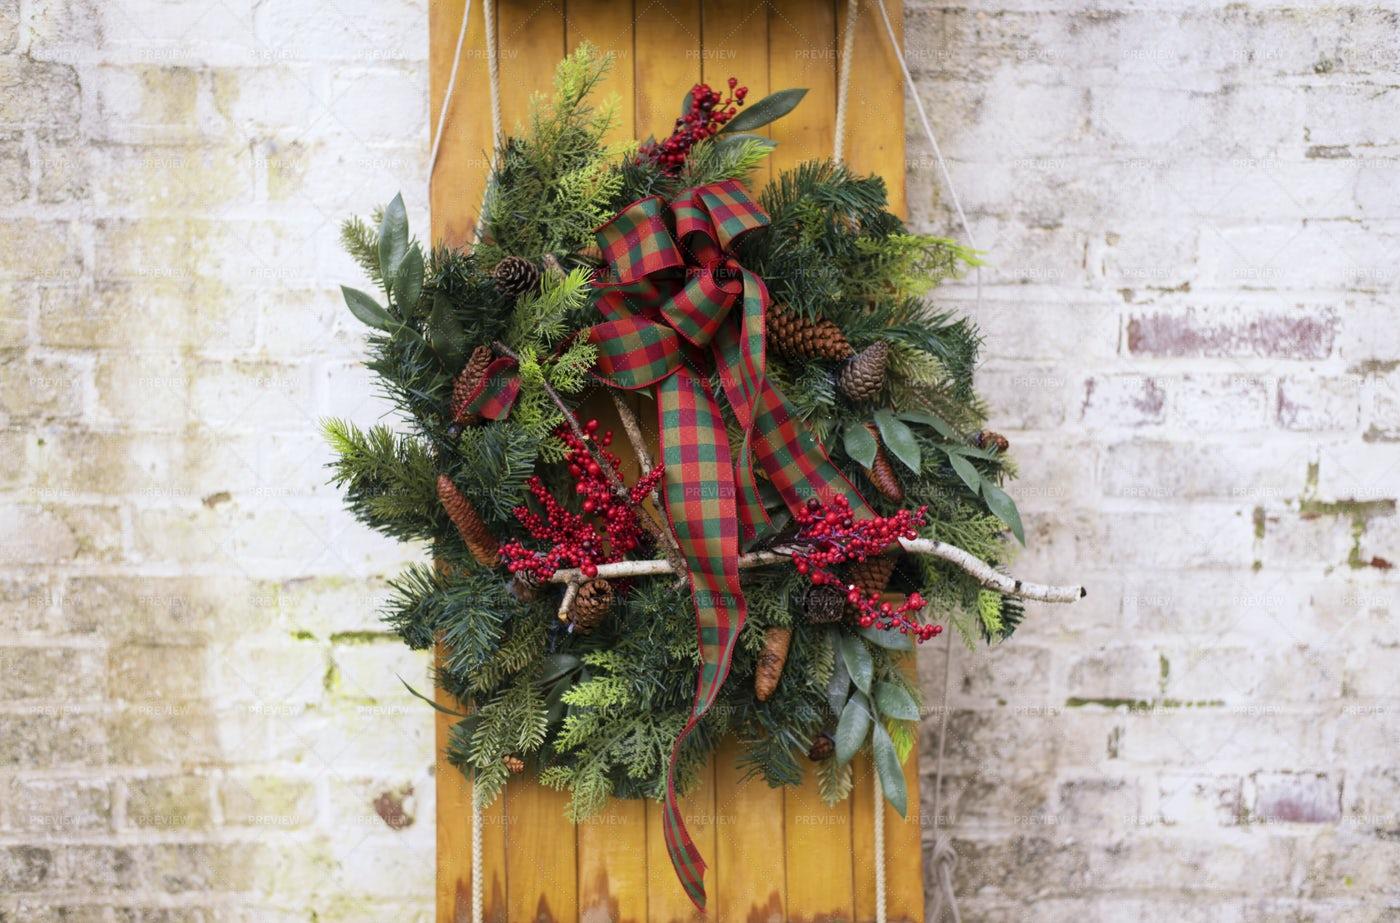 Decorative Holiday Wreath: Stock Photos